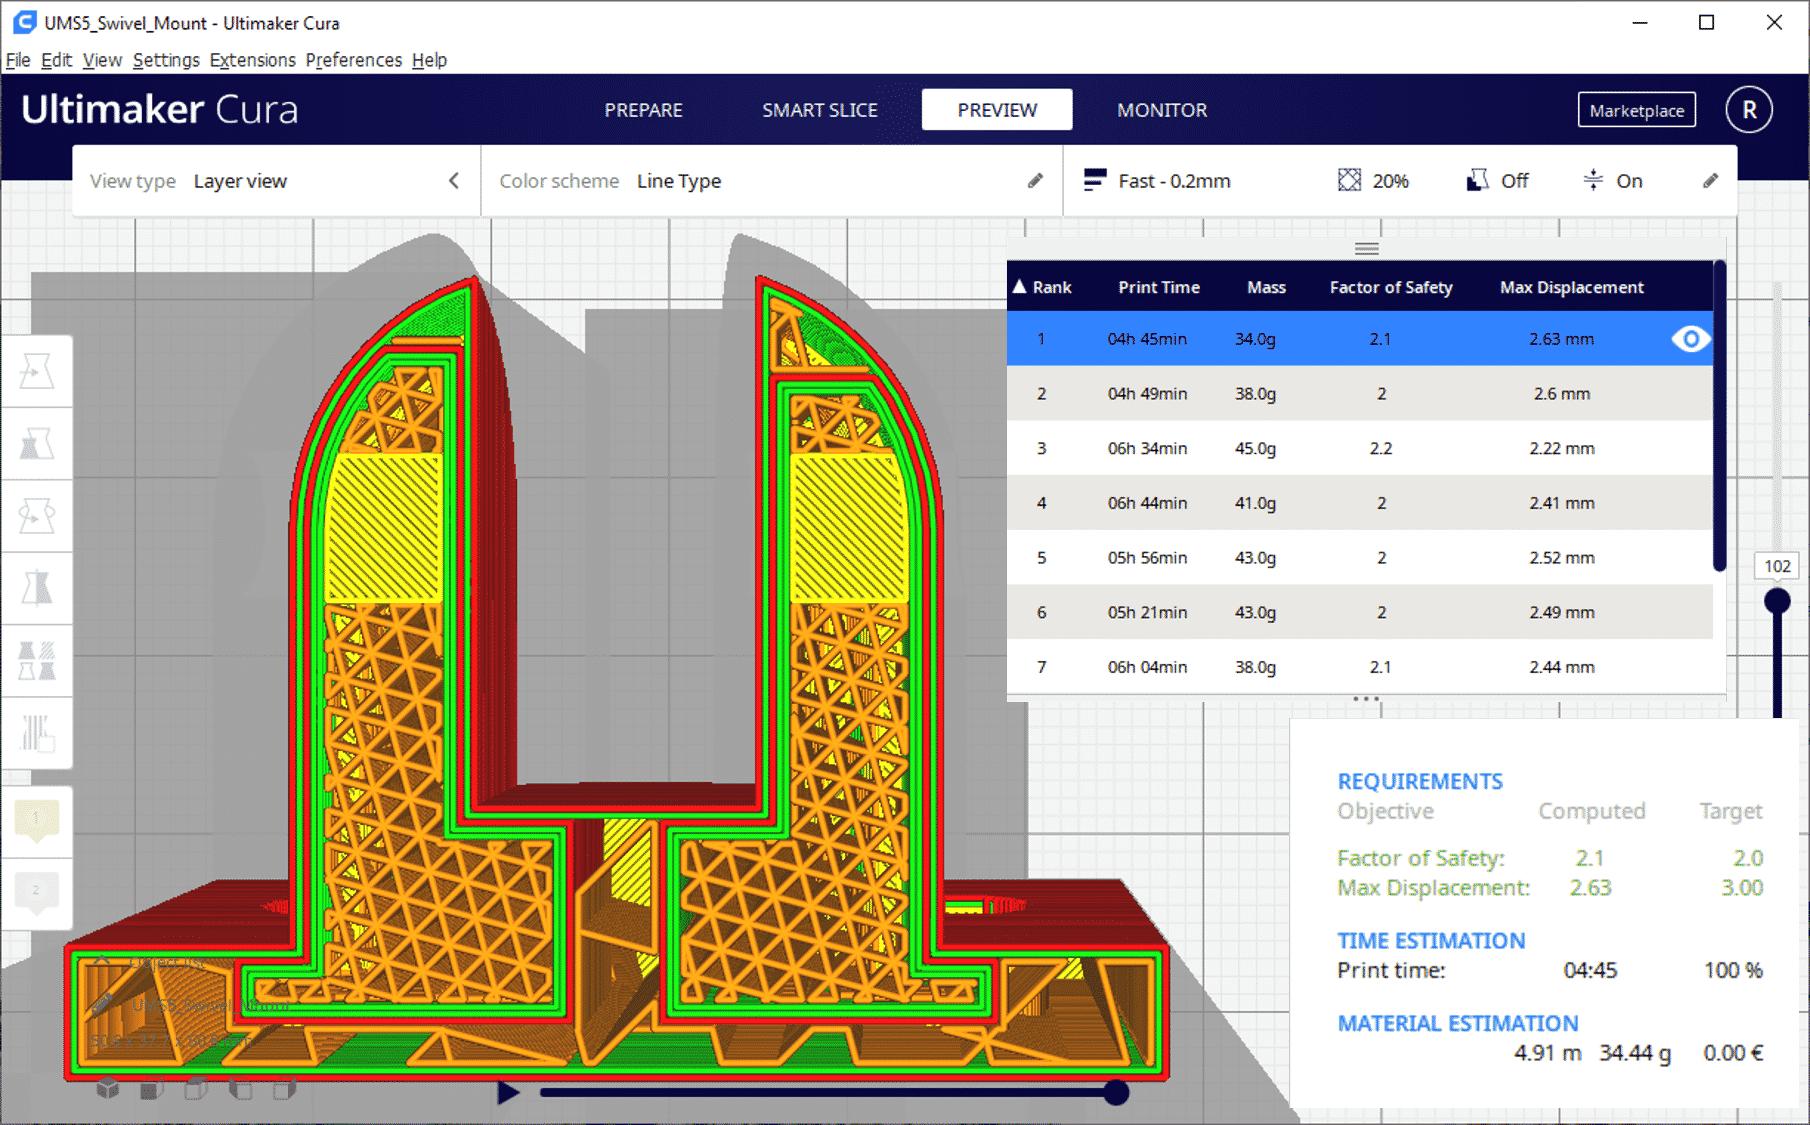 Smart Slice par Teton simulation